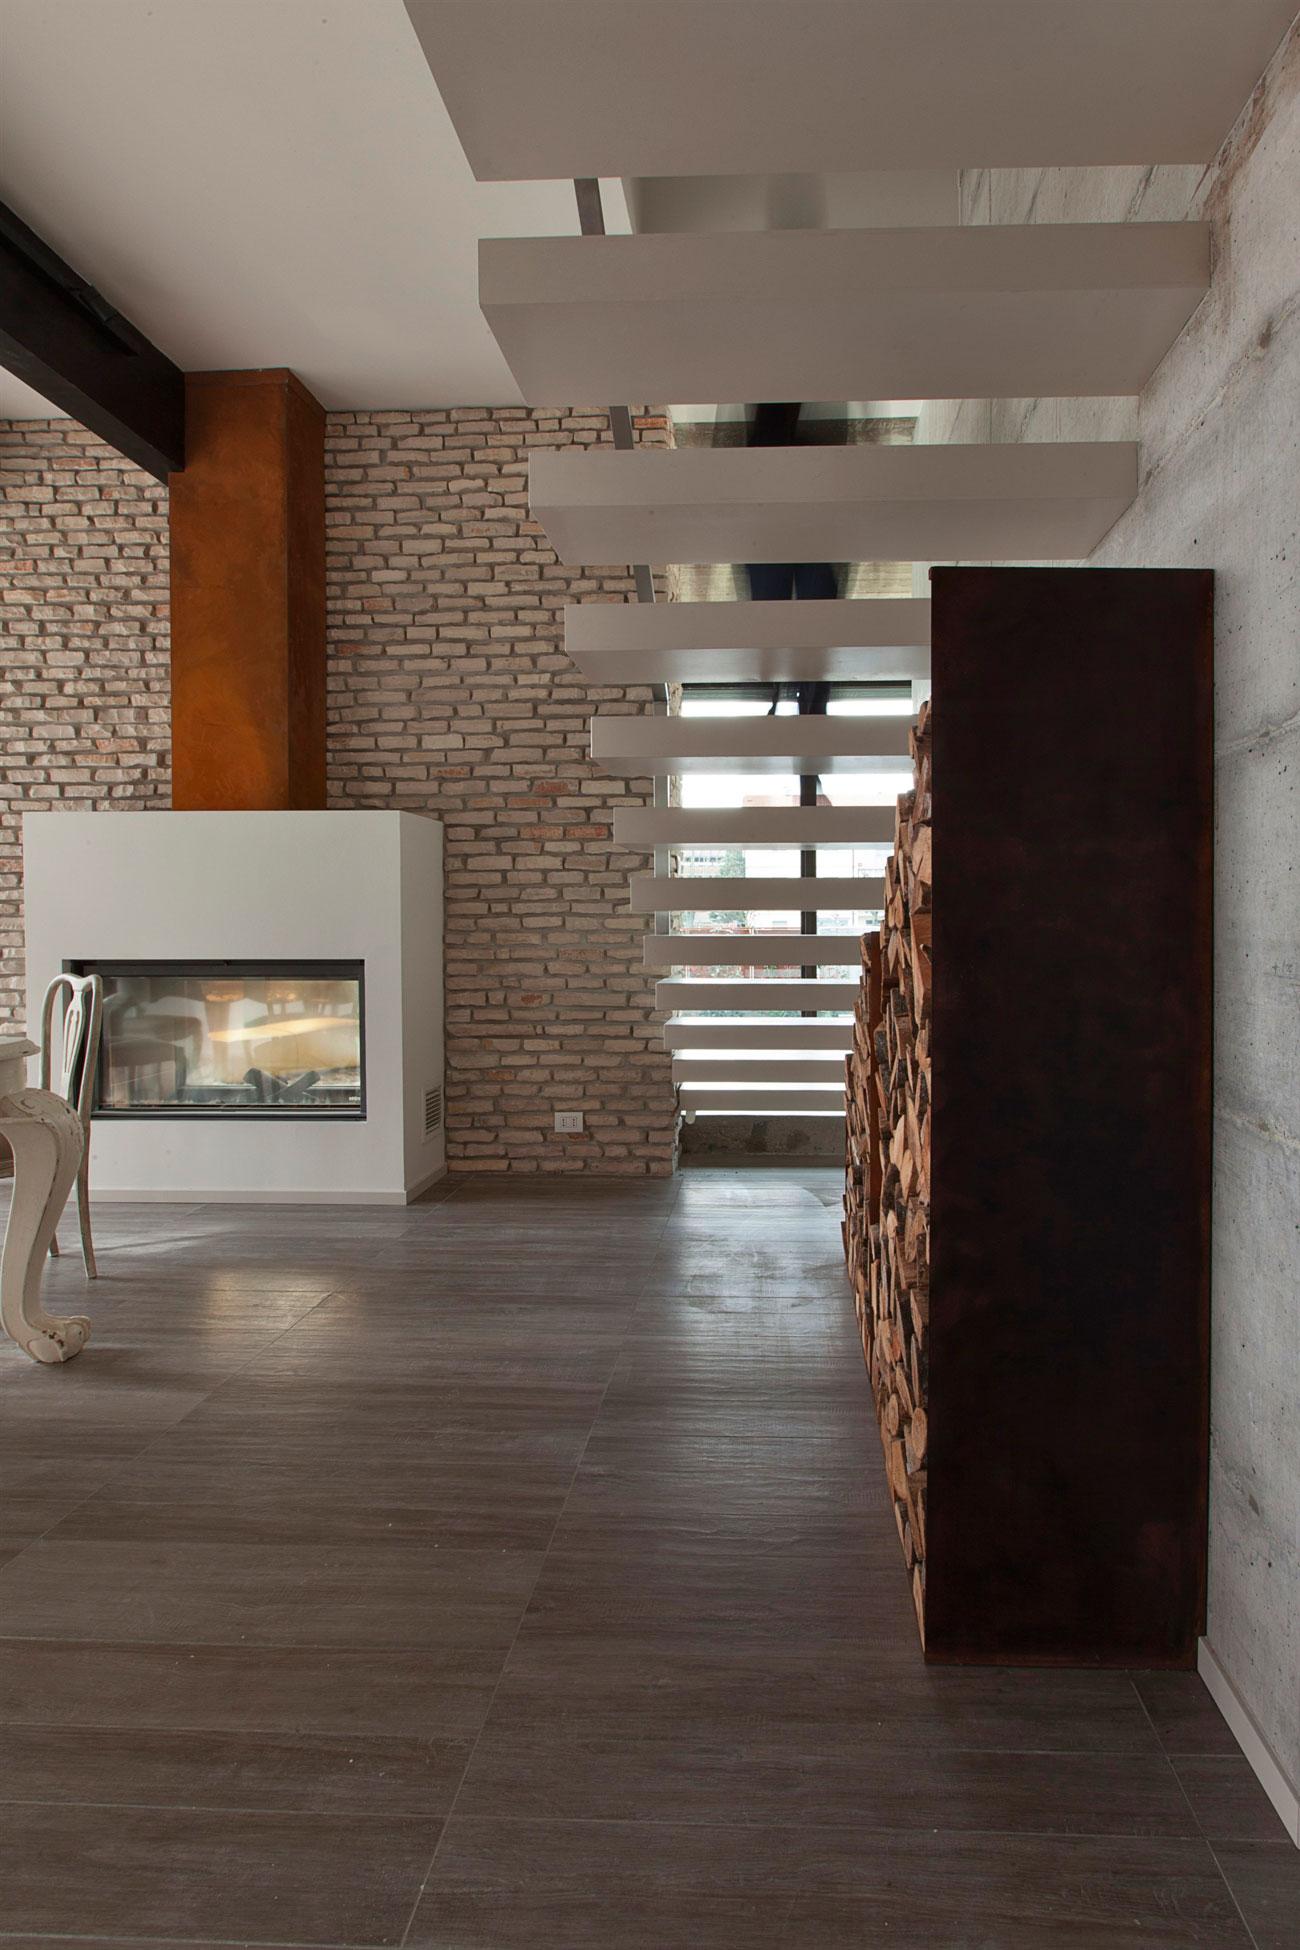 D'Autore Residence near Bologna by Giraldi Associati Architetti-24